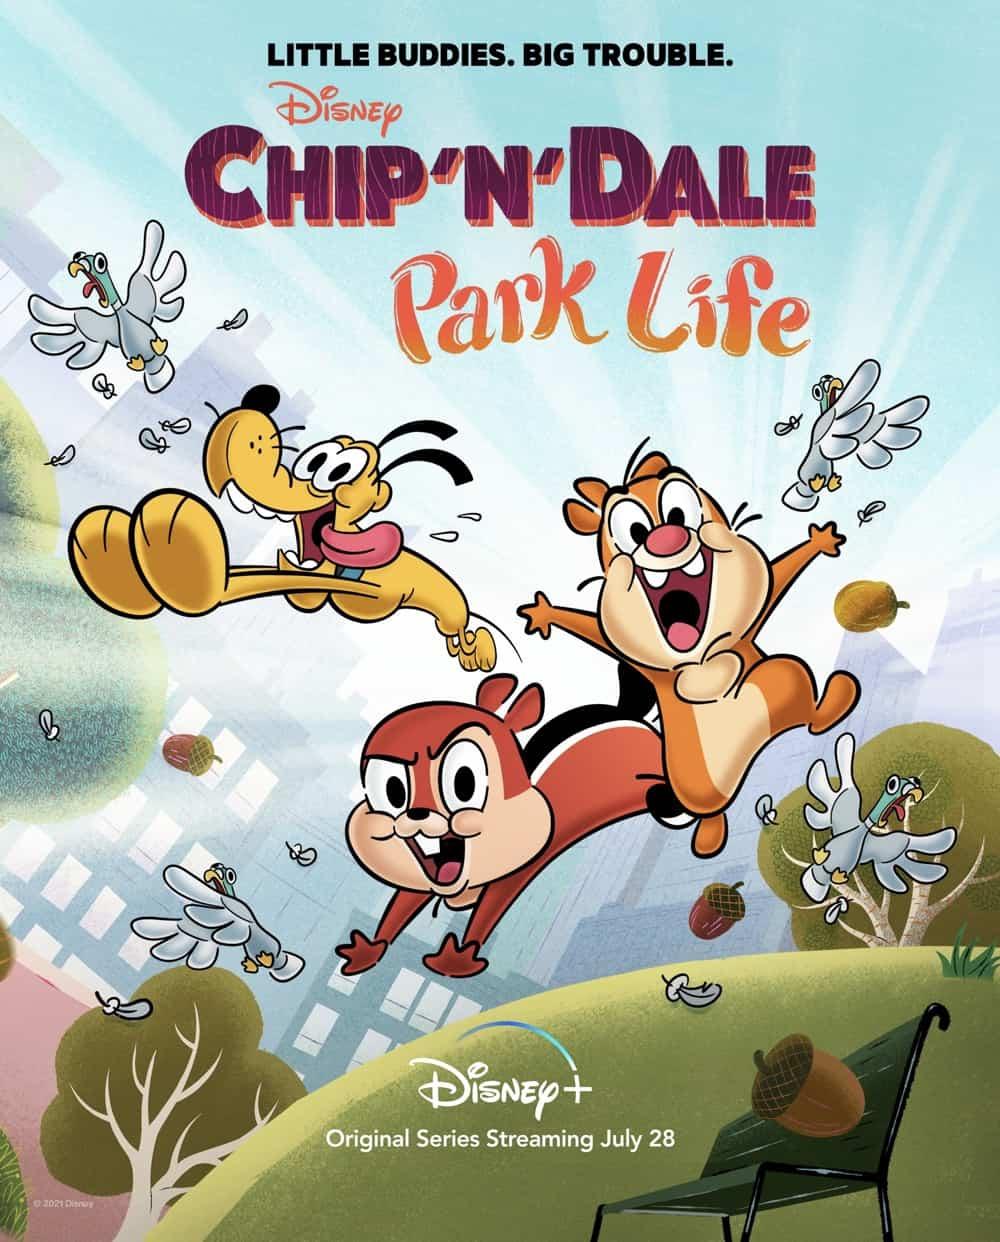 Chip N Dale Park Life Poster Key Art Disney+